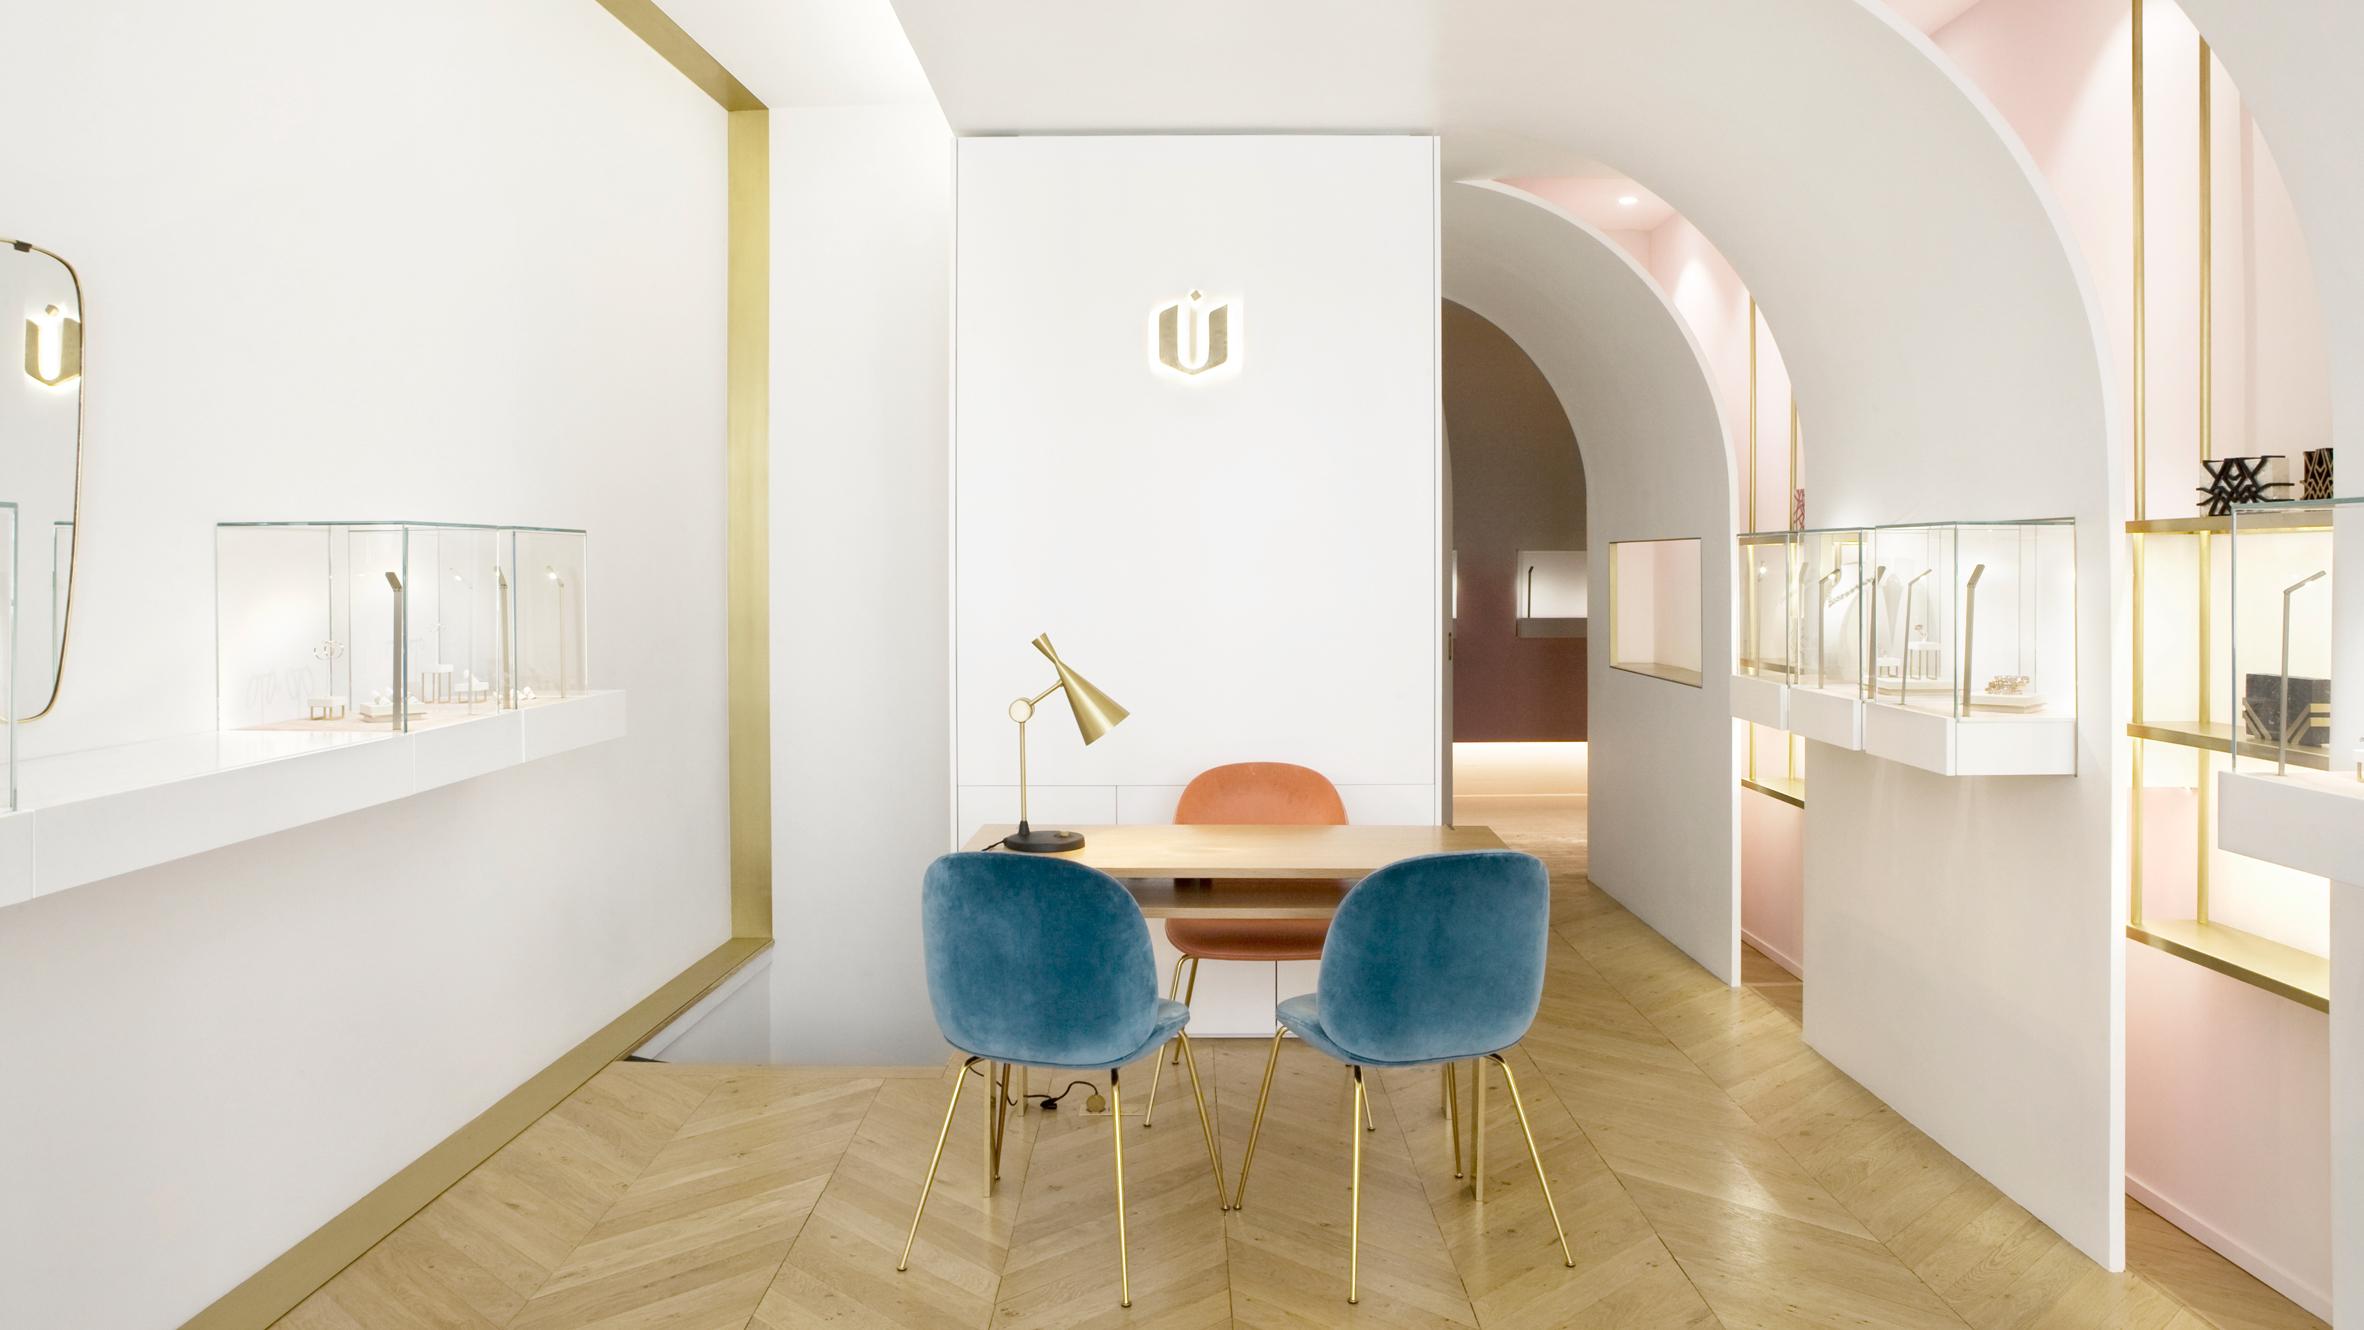 nuun-jewellery-shop-java-architectes-interiors-retail-paris-france_dezeen_hero.jpg